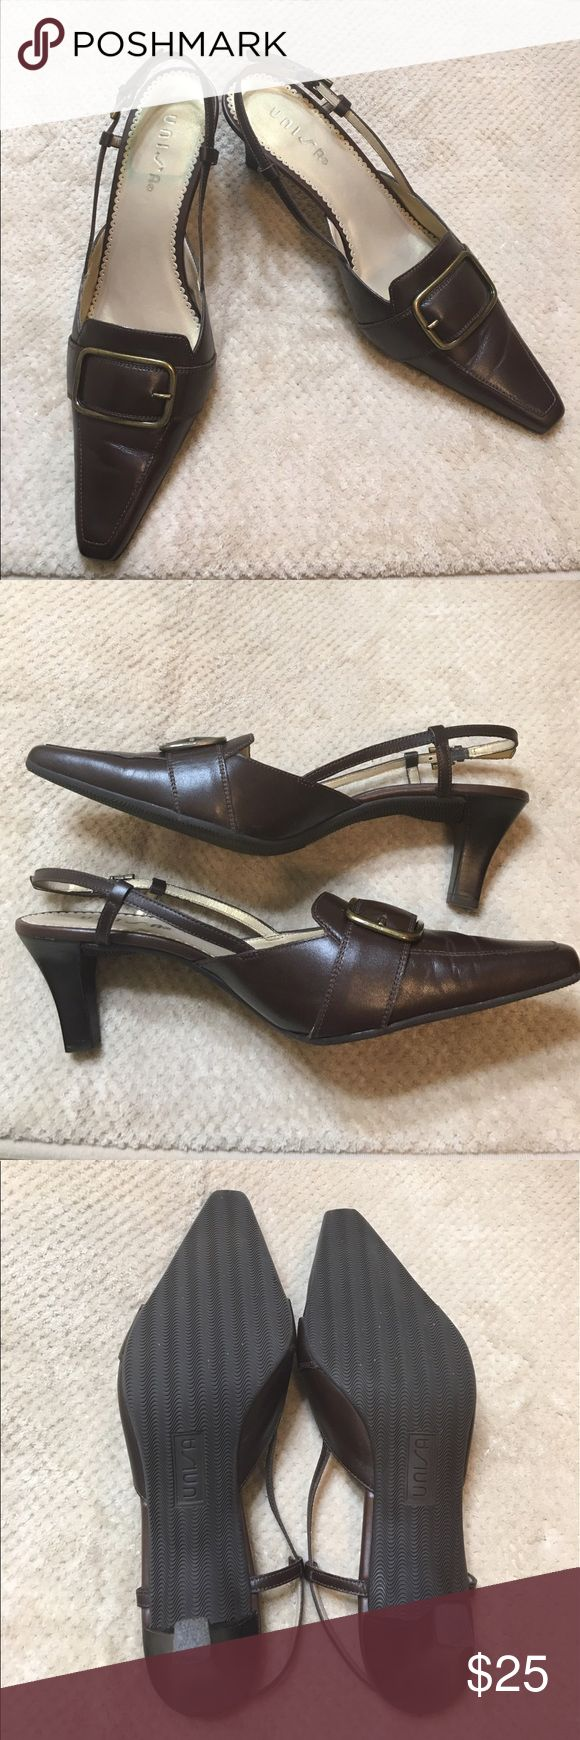 "Unisa Buckeye Devcal Slingback Sandals Genuine leather brown slingback with 2.75"" heel. Great condition with moderate wear on heel. Unisa Shoes Heels"